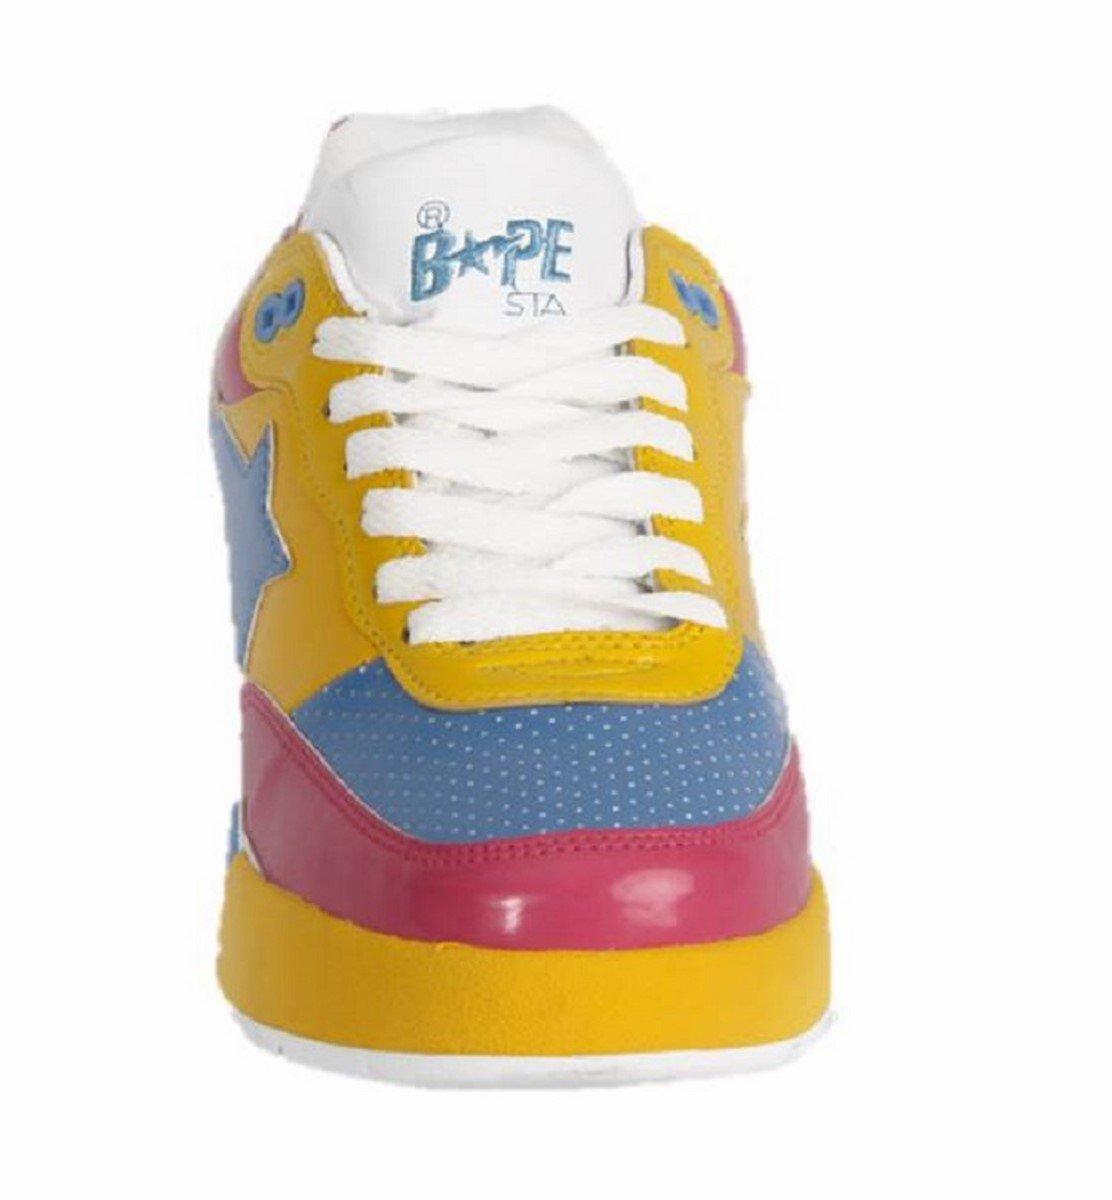 Bathing Ape Bapesta Bapesta Bapesta Bape Sneakers Rosa/JADE/Amarillo cd8e10